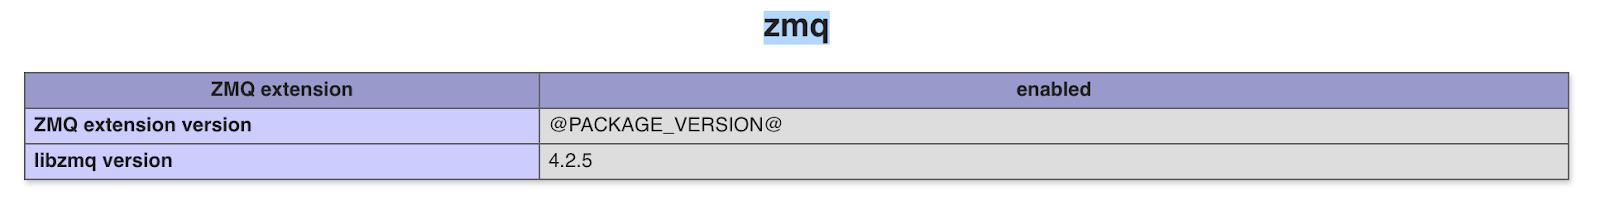 Tutorial programming: Engine - Install zeroMQ and binding PHP ZMQ